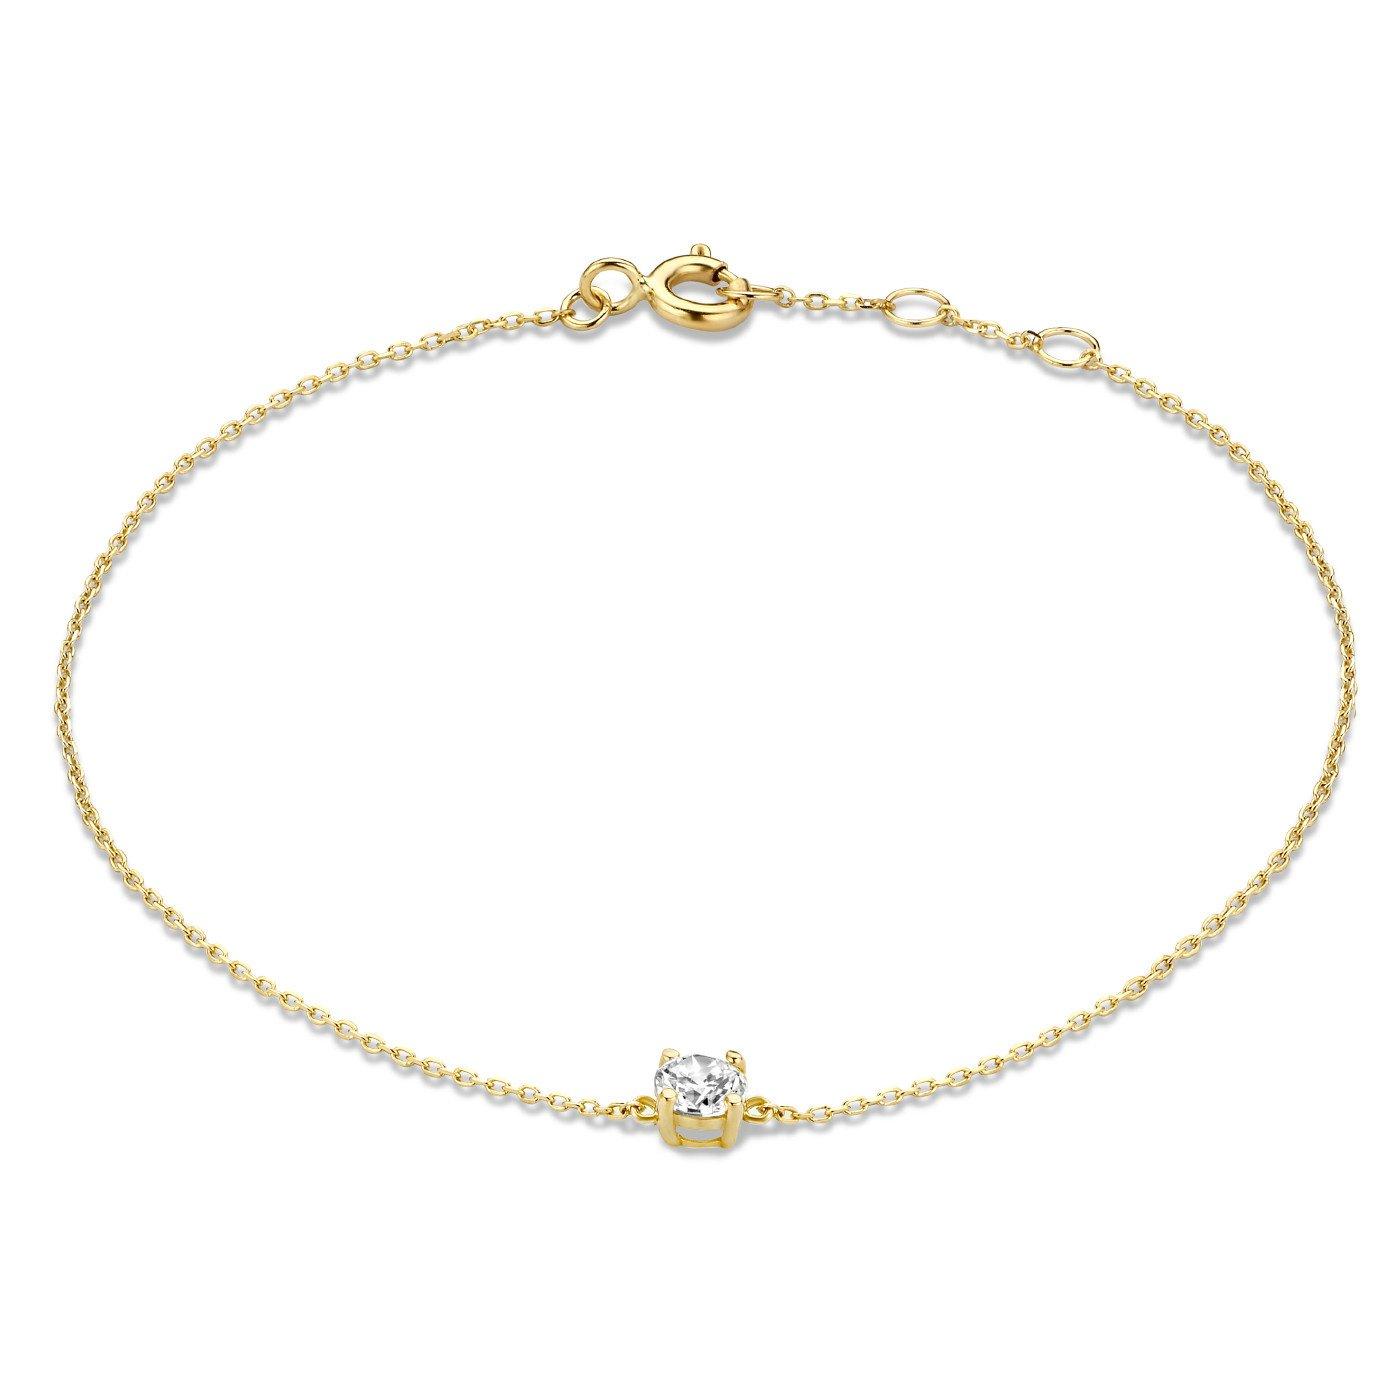 Isabel Bernard Le Marais Isabeau 14 karaat gouden armband met zirkonia